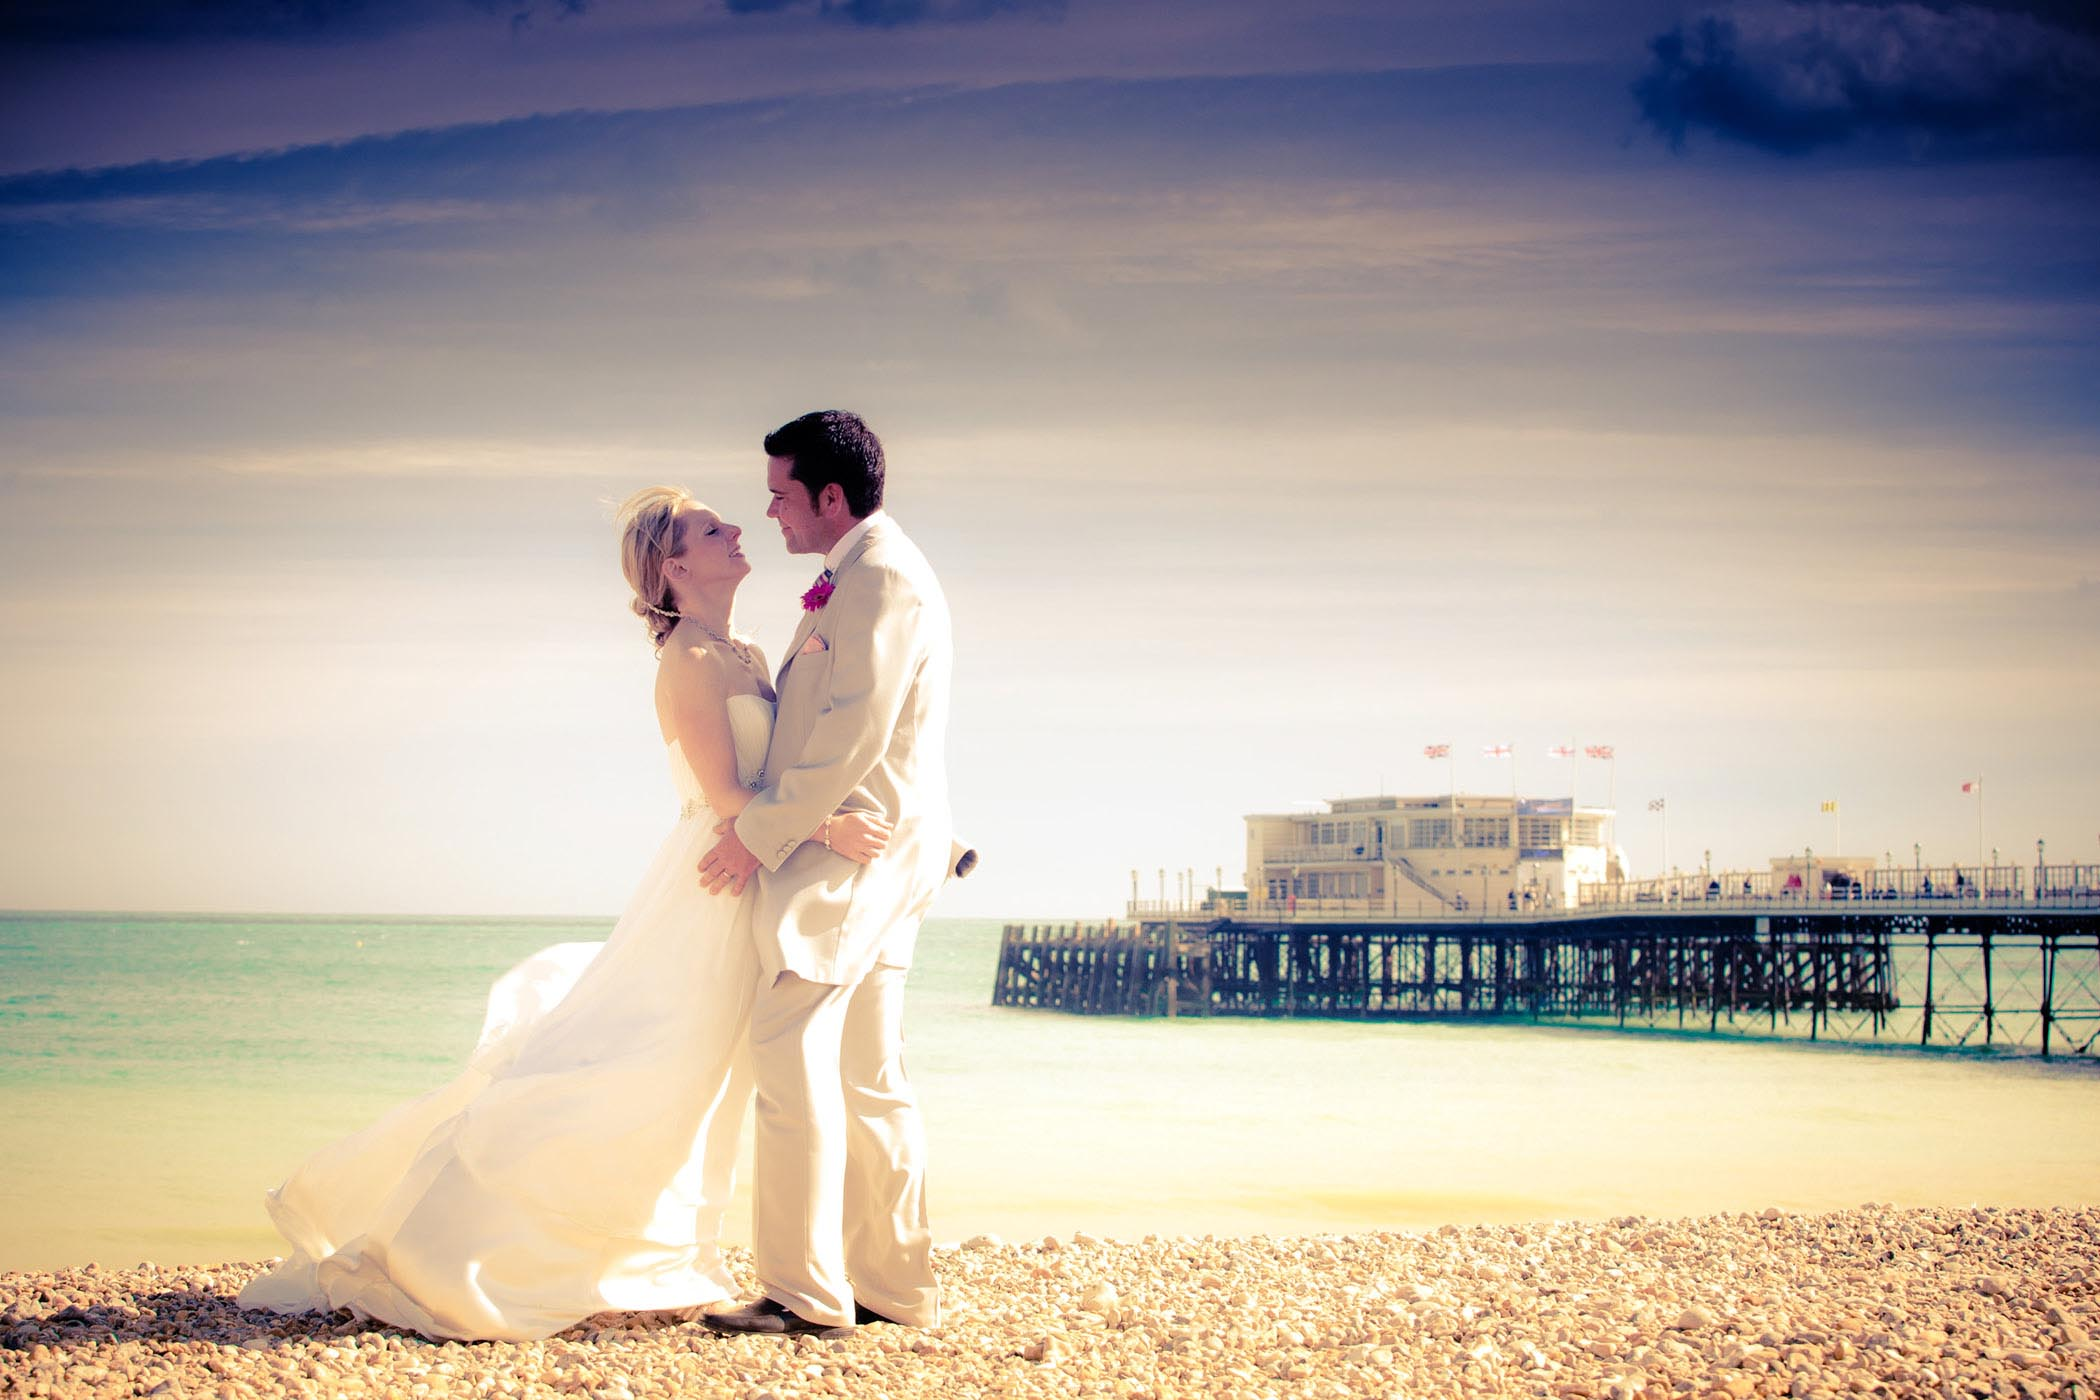 dan_burman_wedding_photography (5).jpg